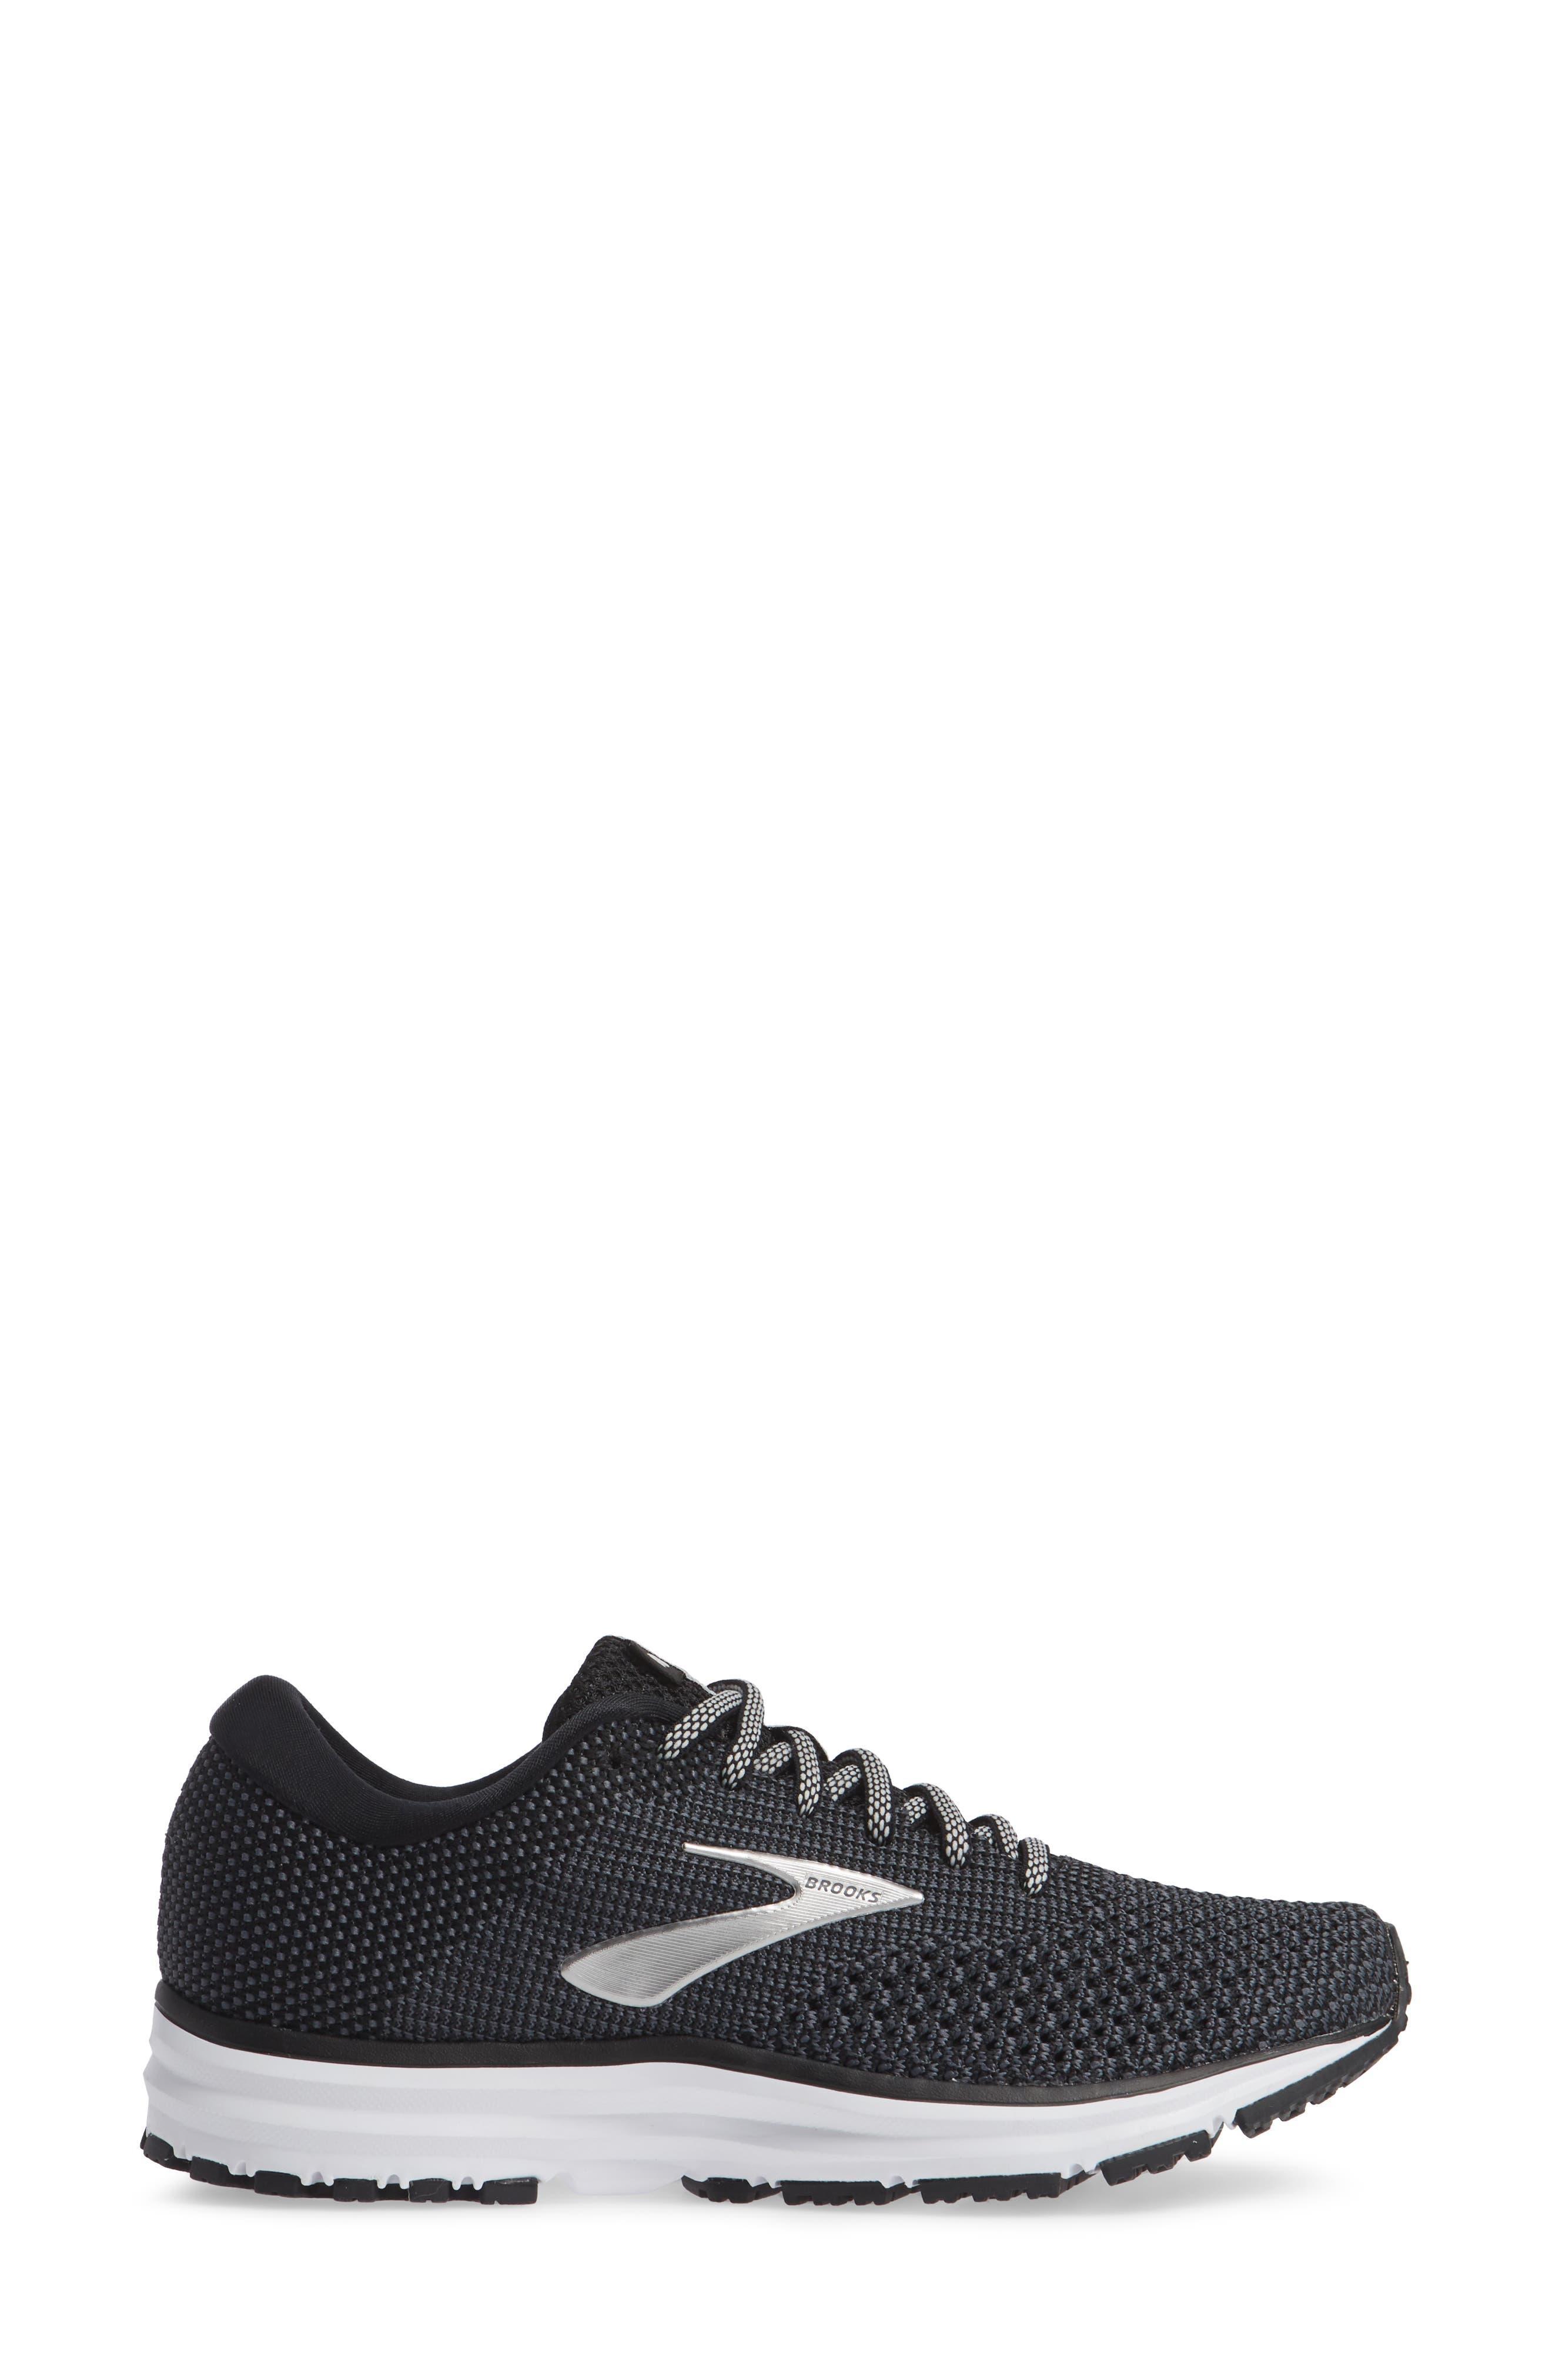 Revel 2 Running Shoe,                             Alternate thumbnail 3, color,                             BLACK/ GREY/ GREY